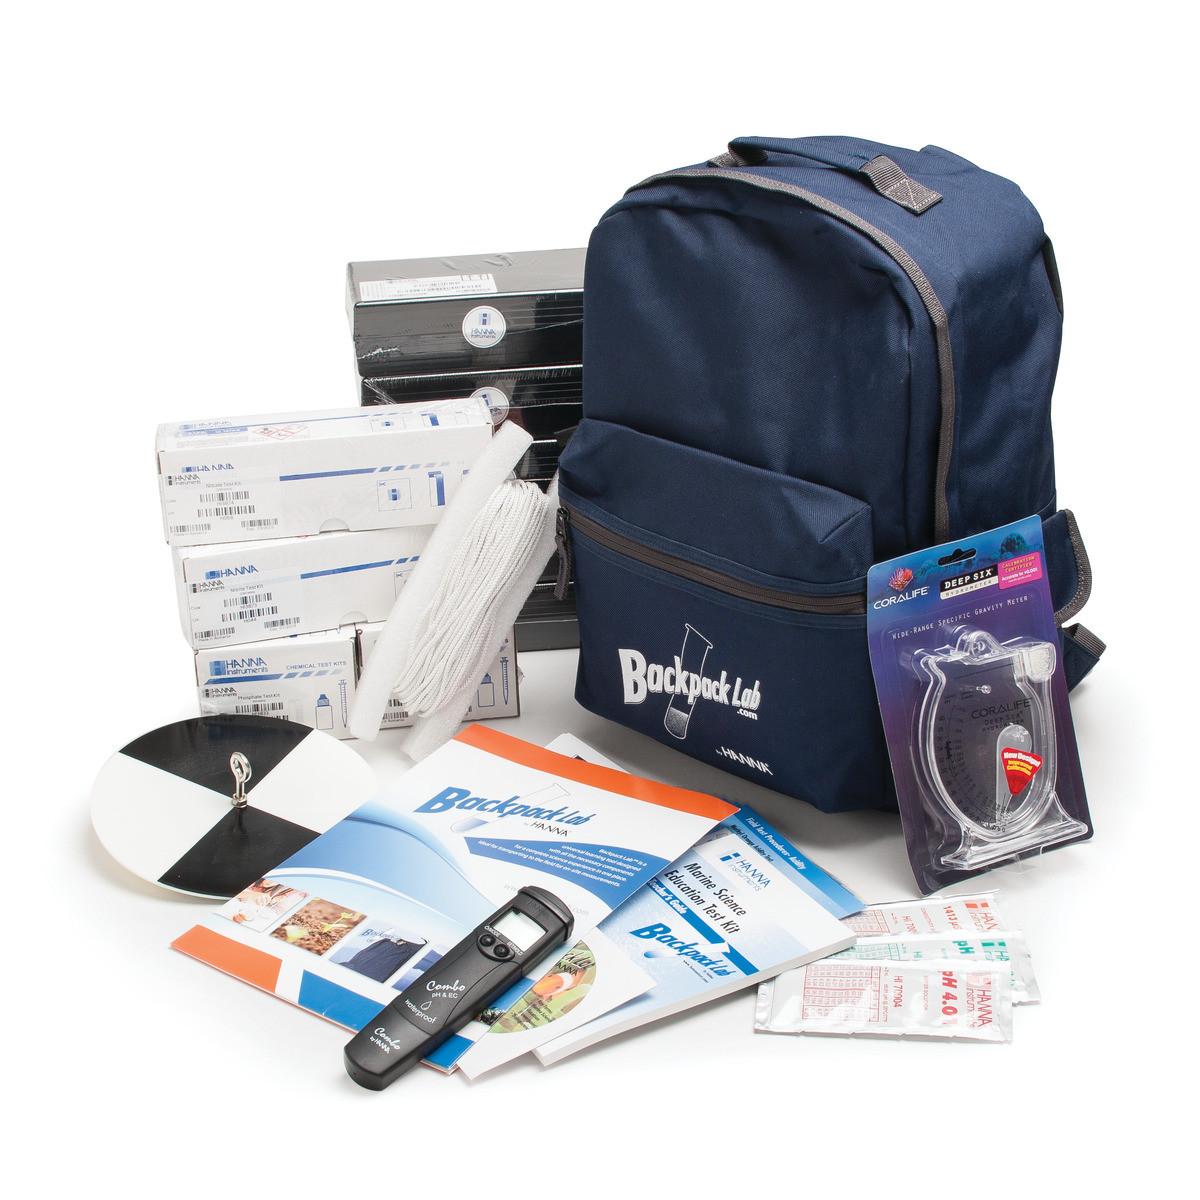 Backpack Lab Marine Science Educational Test Kit